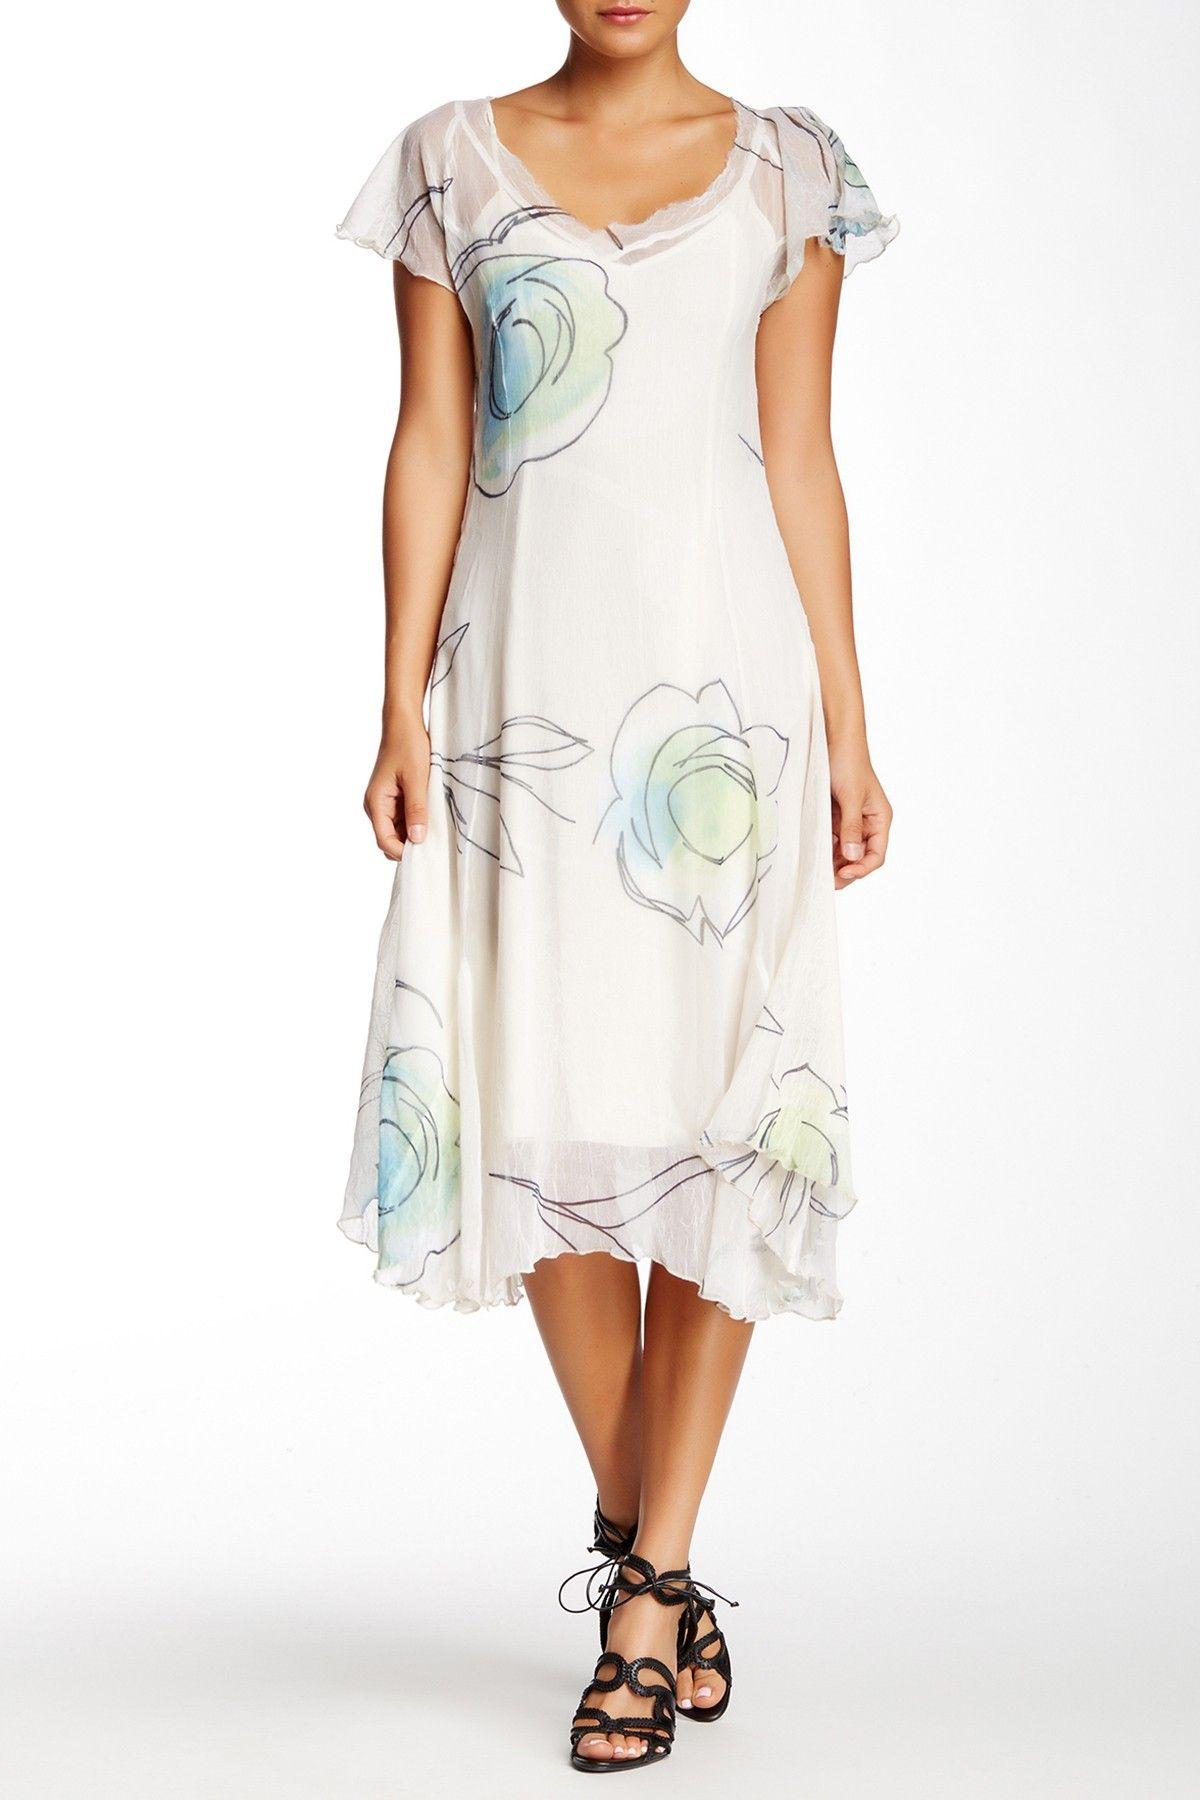 Butterfly Sleeve Chiffon Midi Dress by KOMAROV on @nordstrom_rack